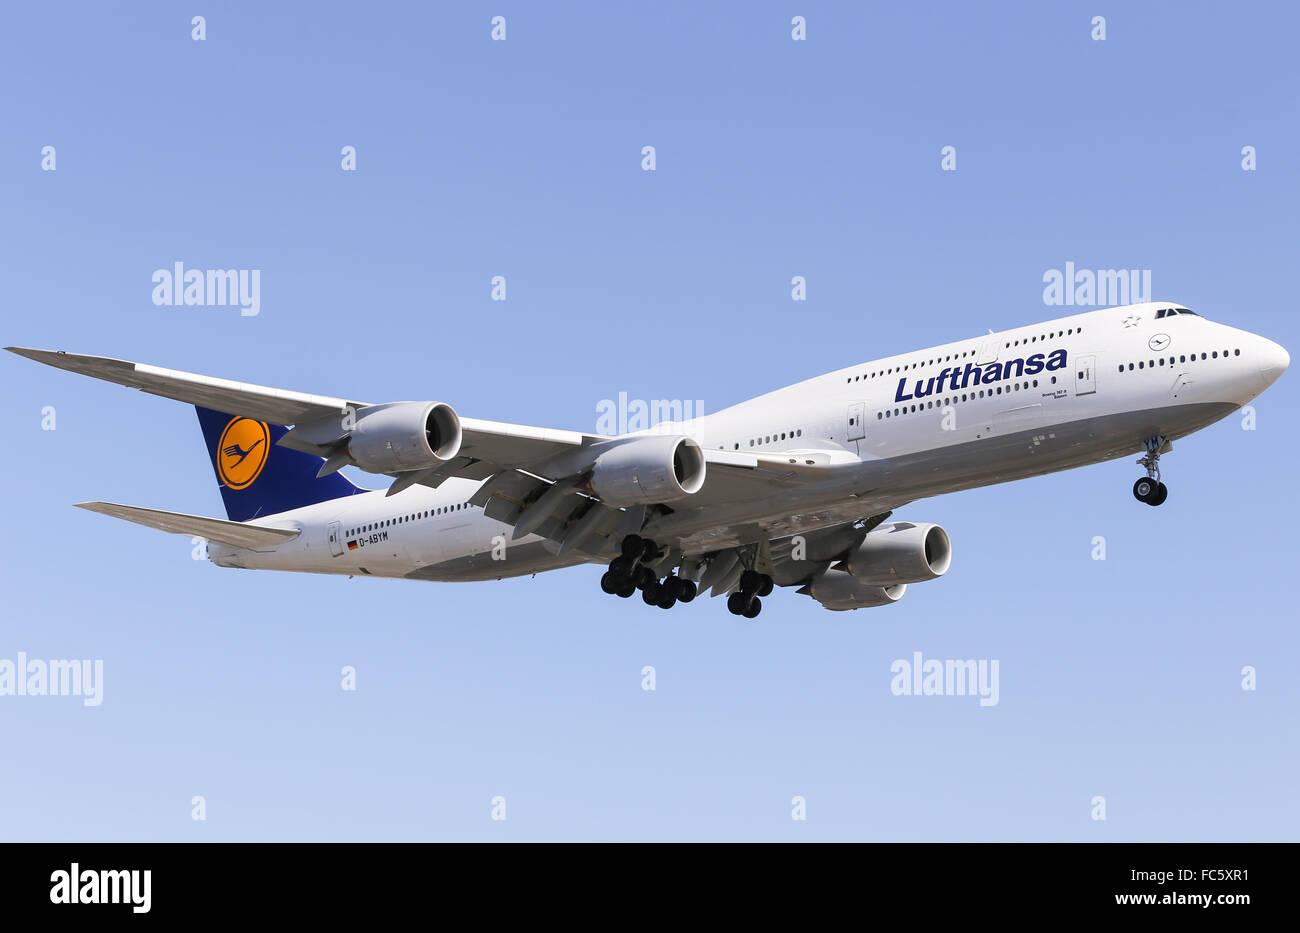 Lufthansa 747-8 - Stock Image